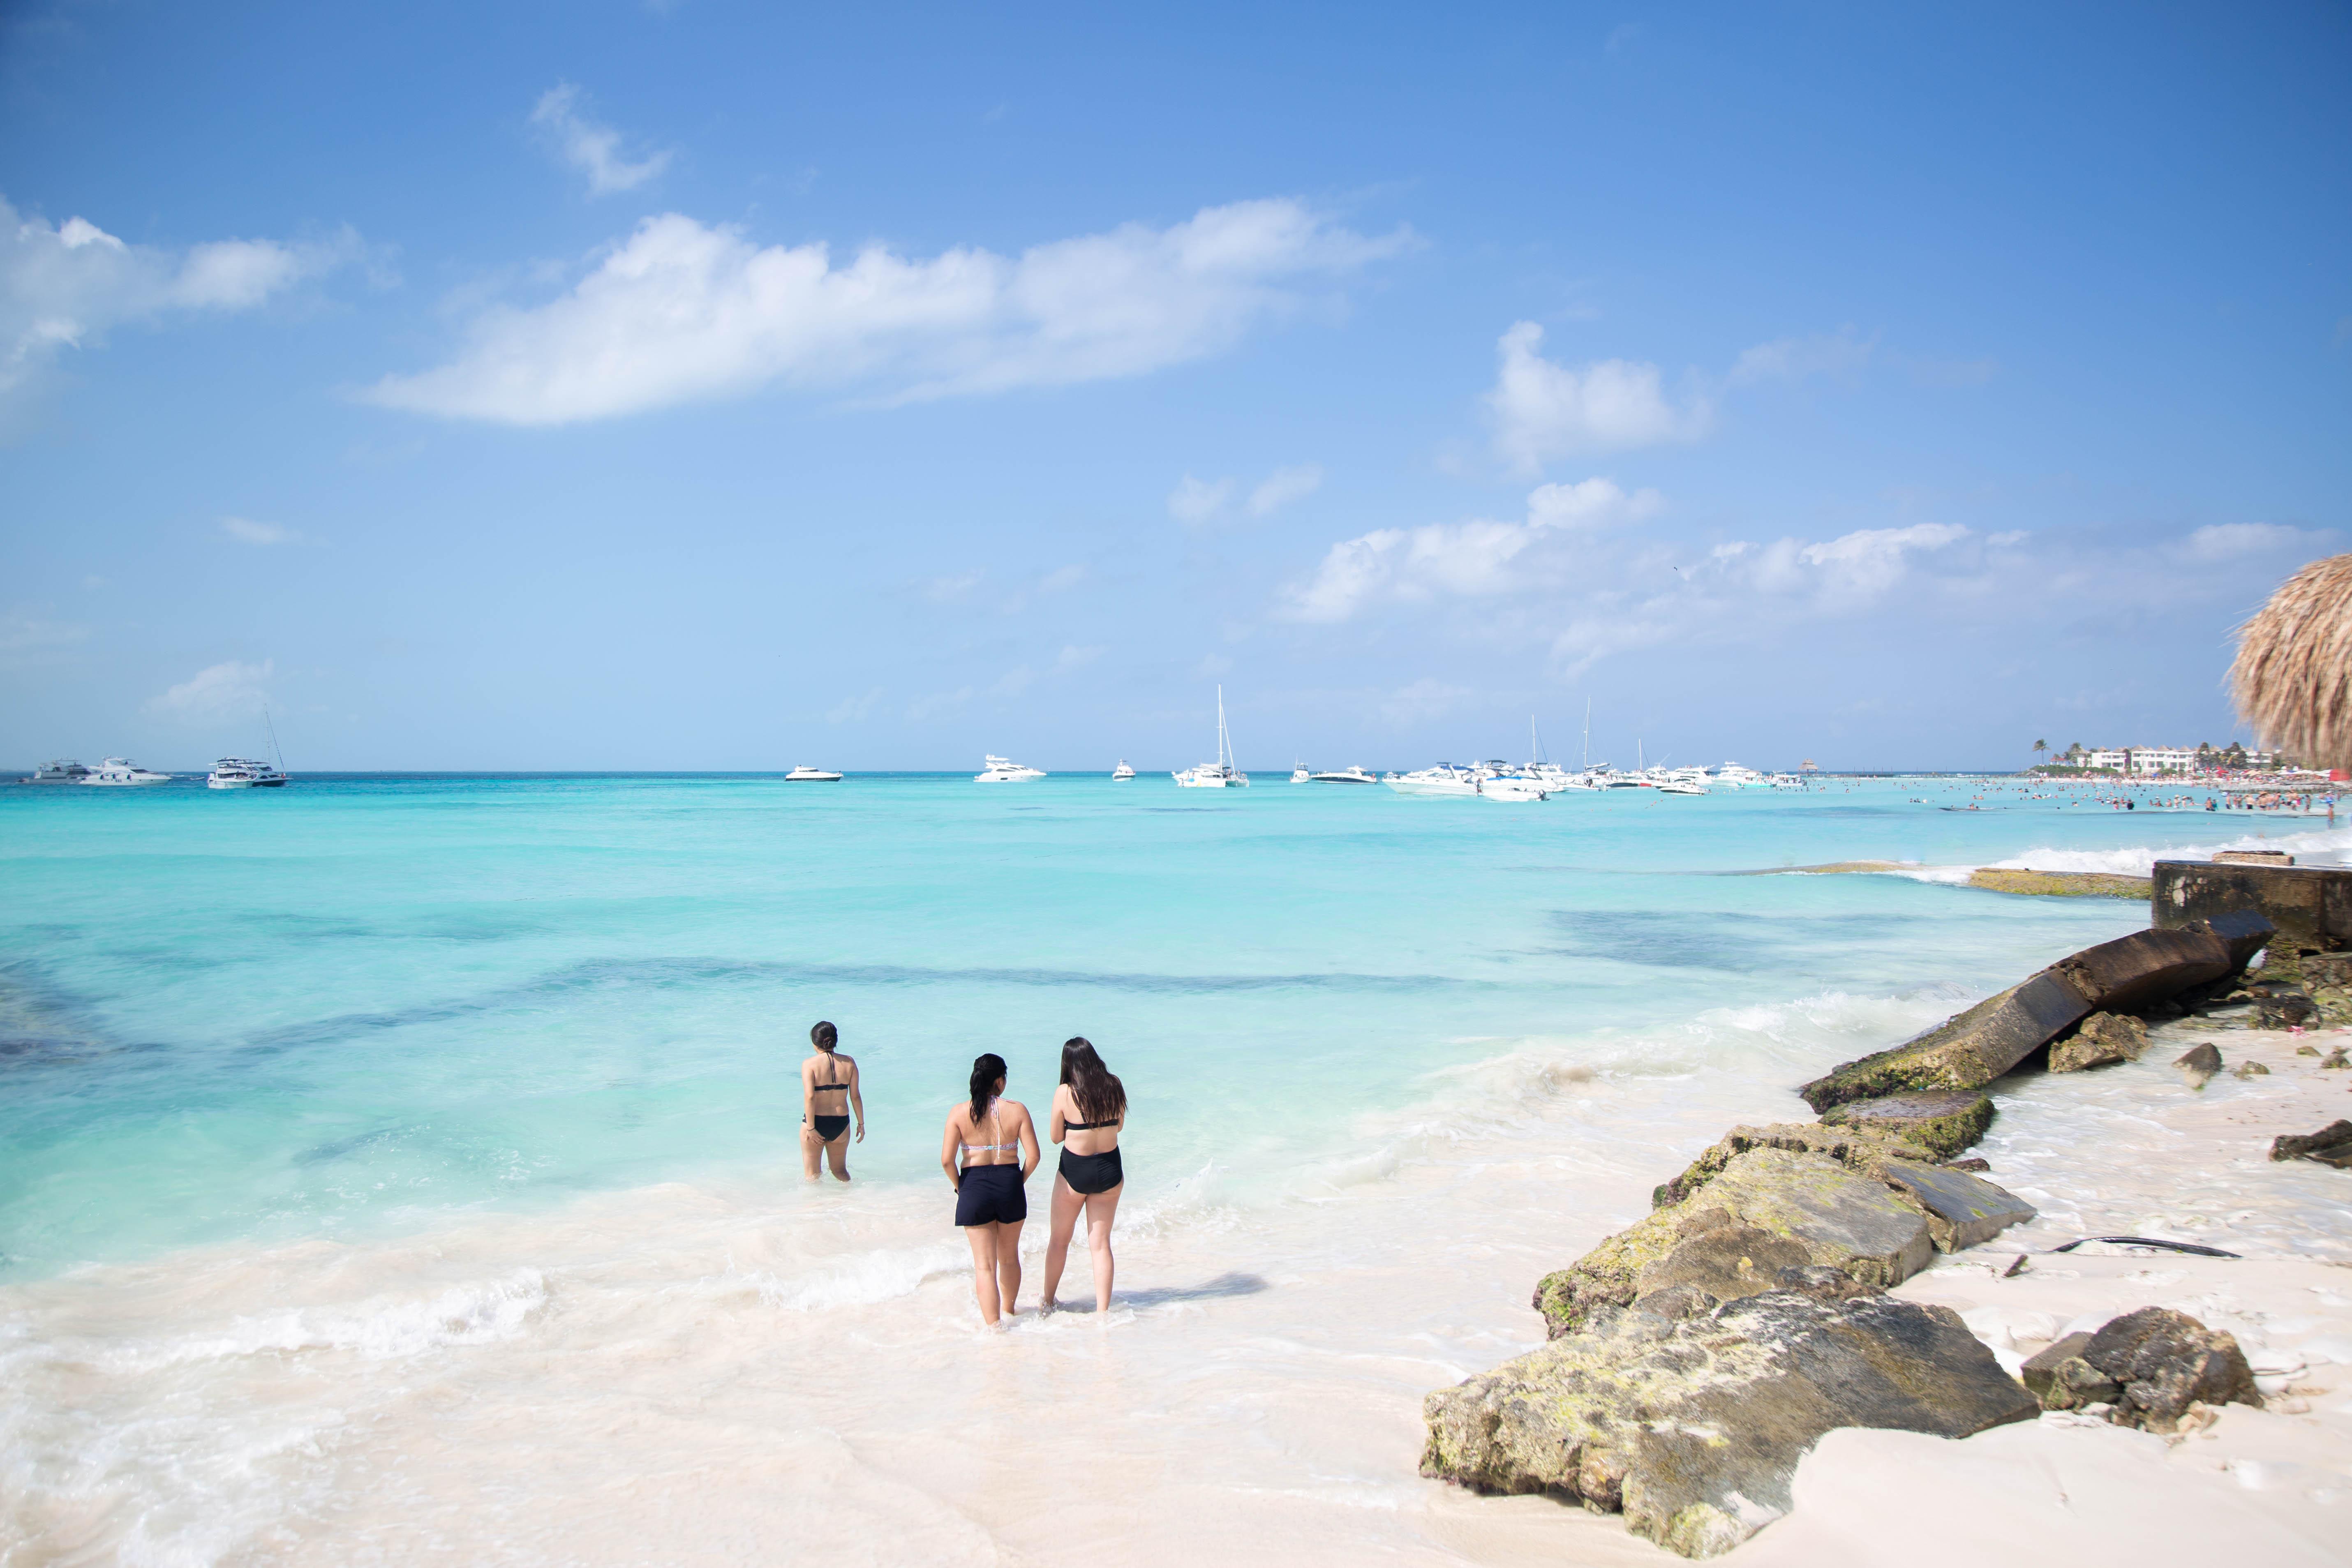 3 Girls at Playa Norte beach in Isla Mujeres